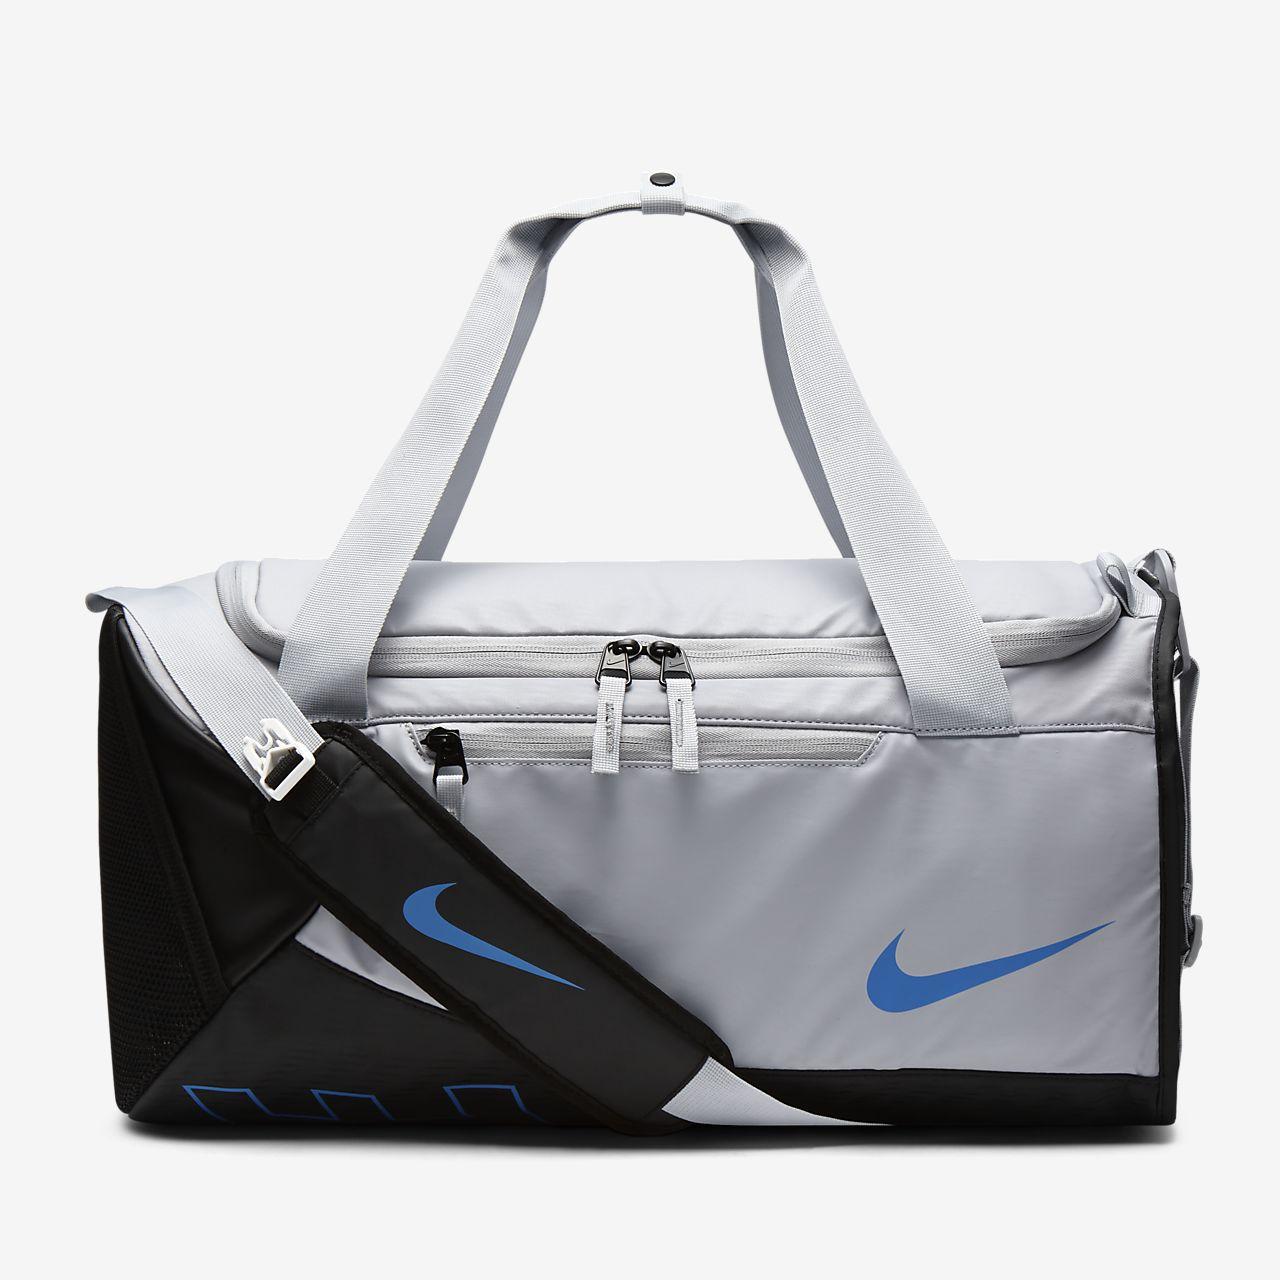 c86156018e Nike Sac de sport Alpha Adapt Cross Body M nnhlm6Ts - tarry ...